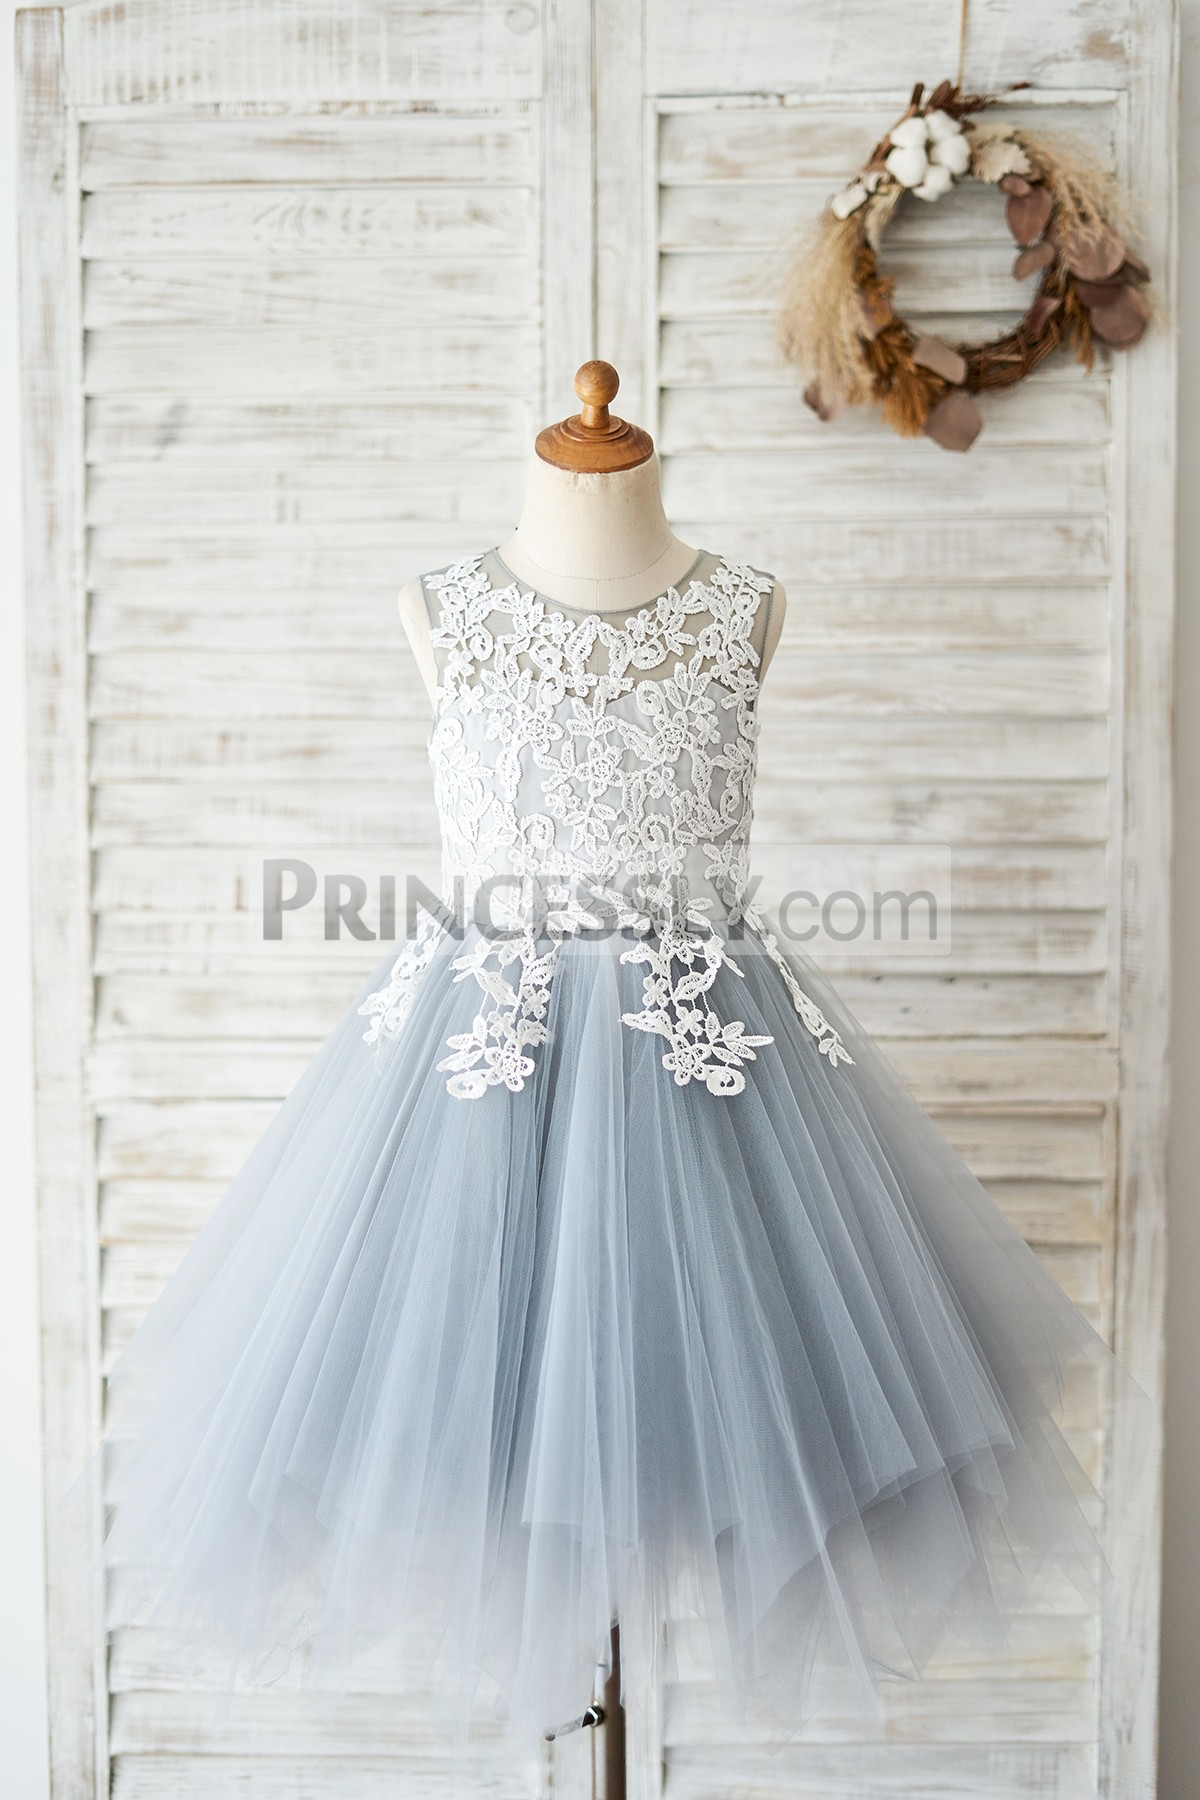 Princessly.com-K1004033-Princess Ivory Lace Gray Tulle Wedding Flower Girl Dress-31